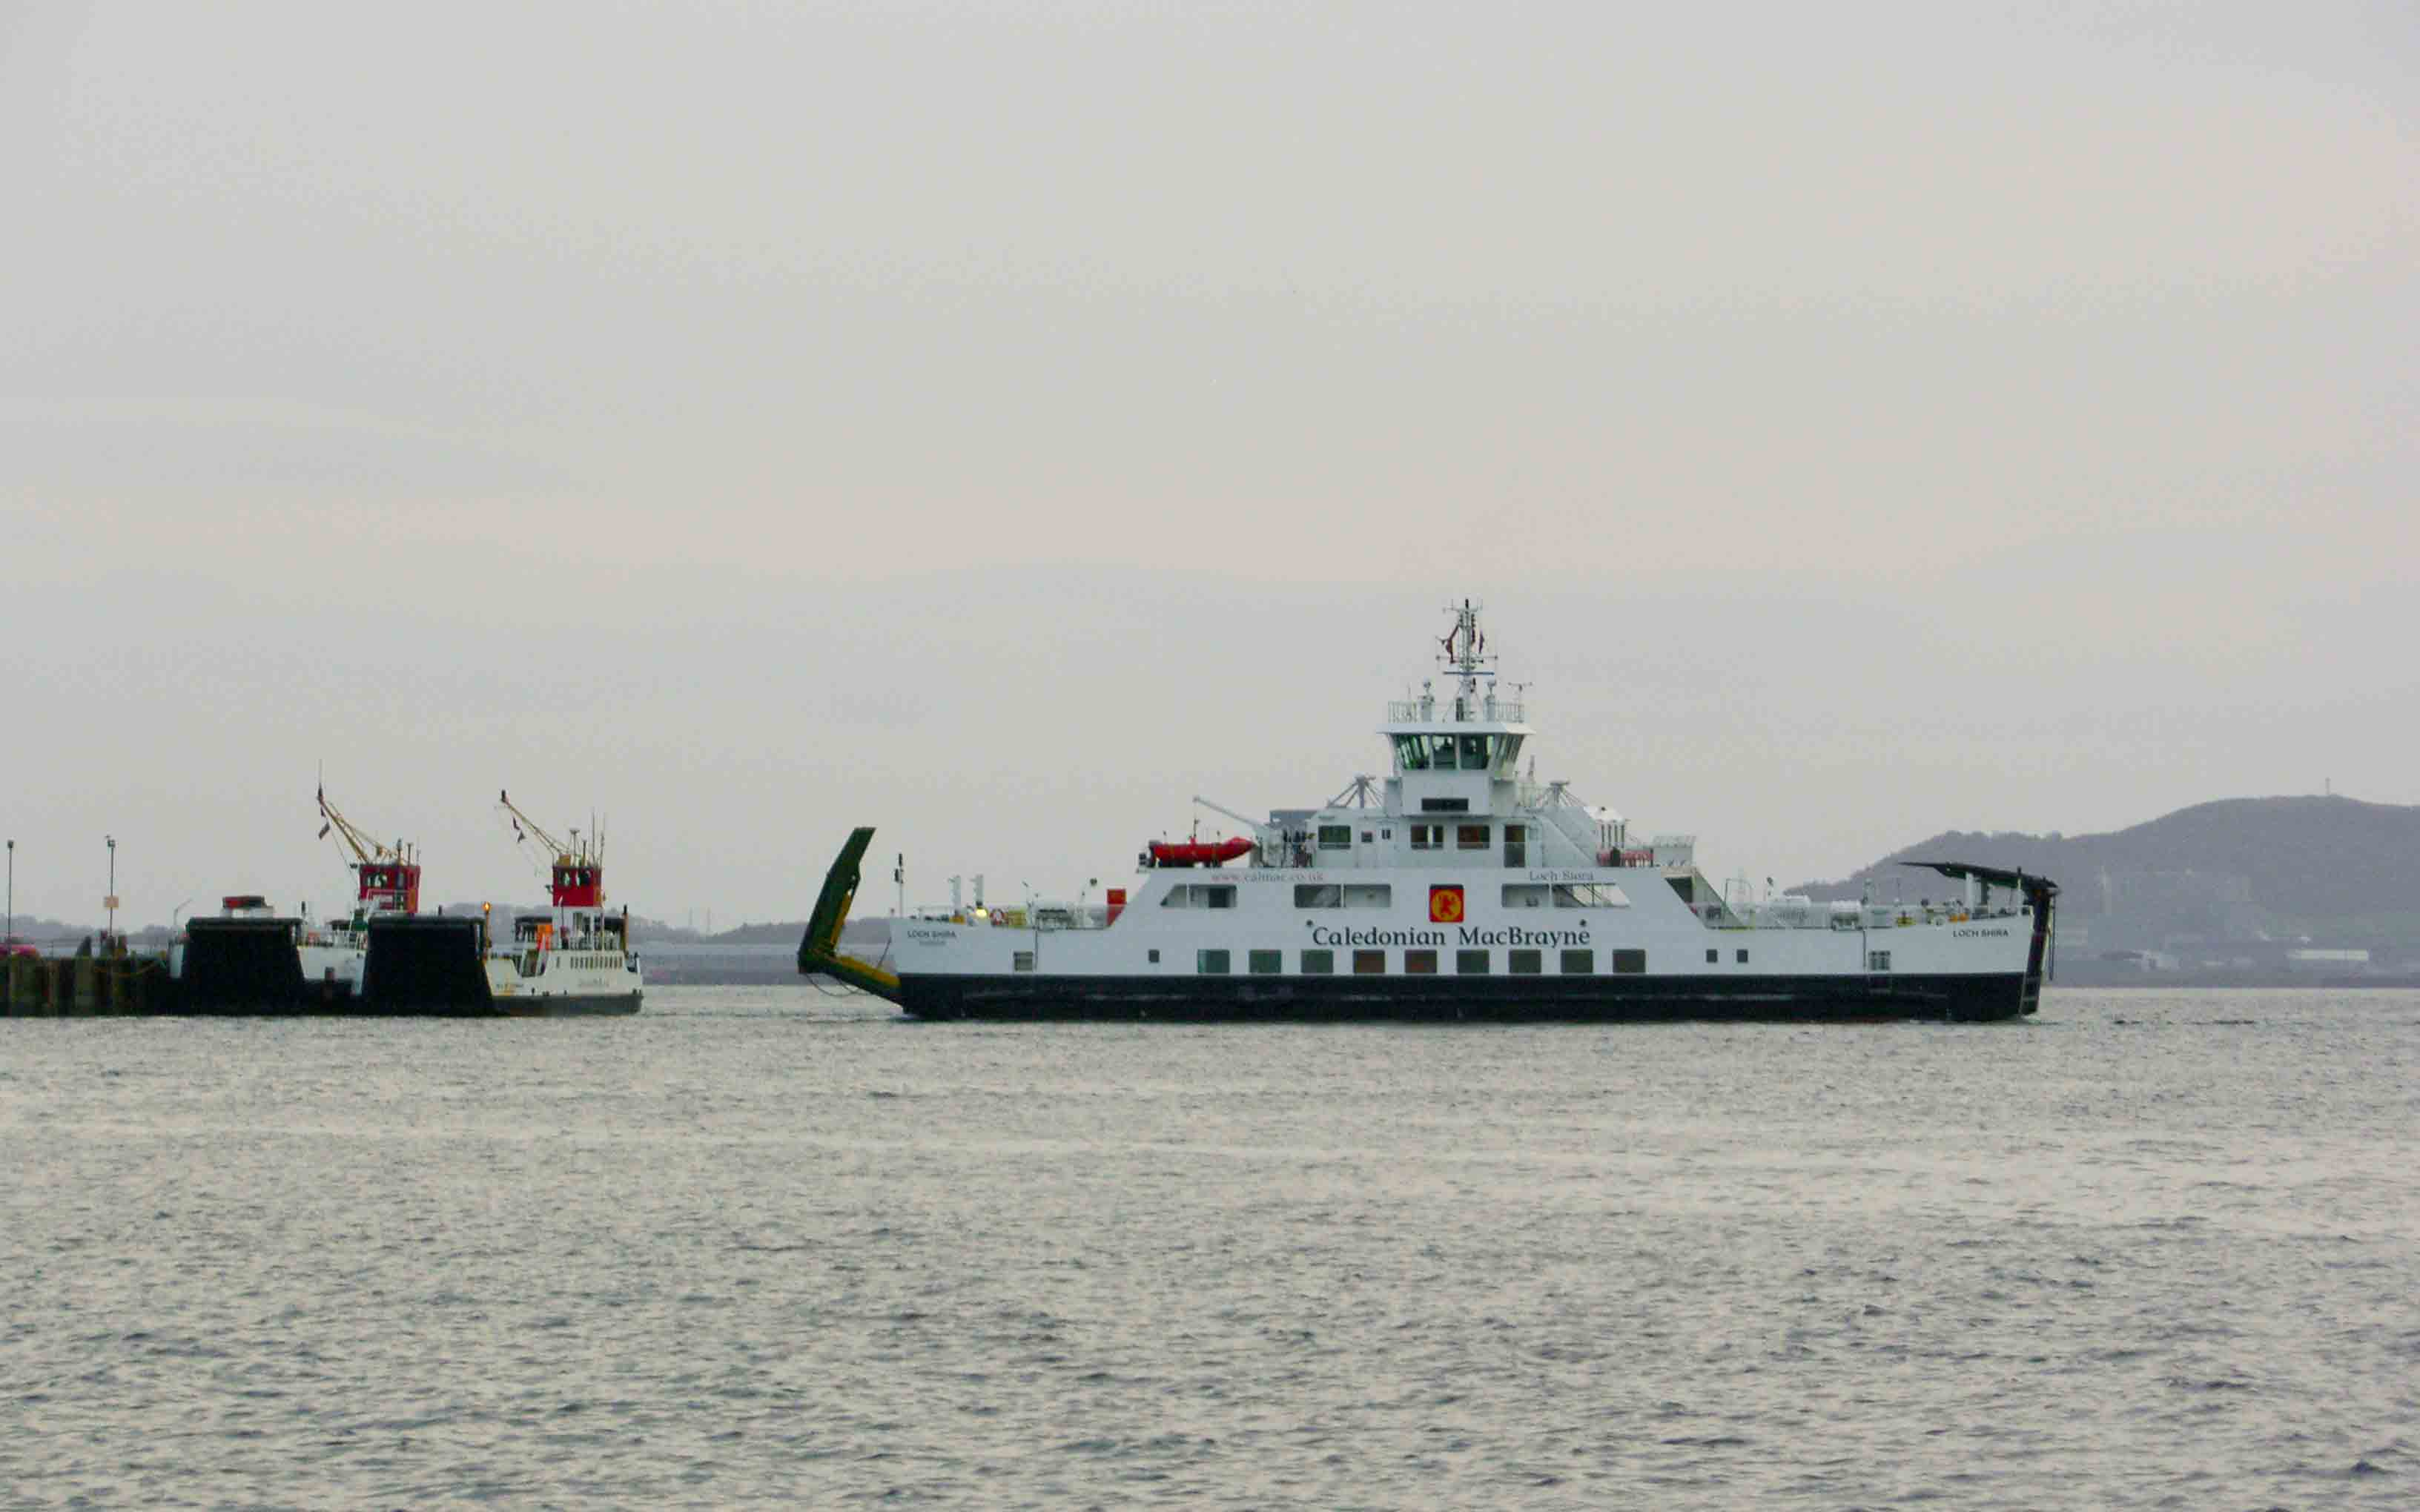 3 generations of Cumbrae ferries at Largs (Ships of CalMac)